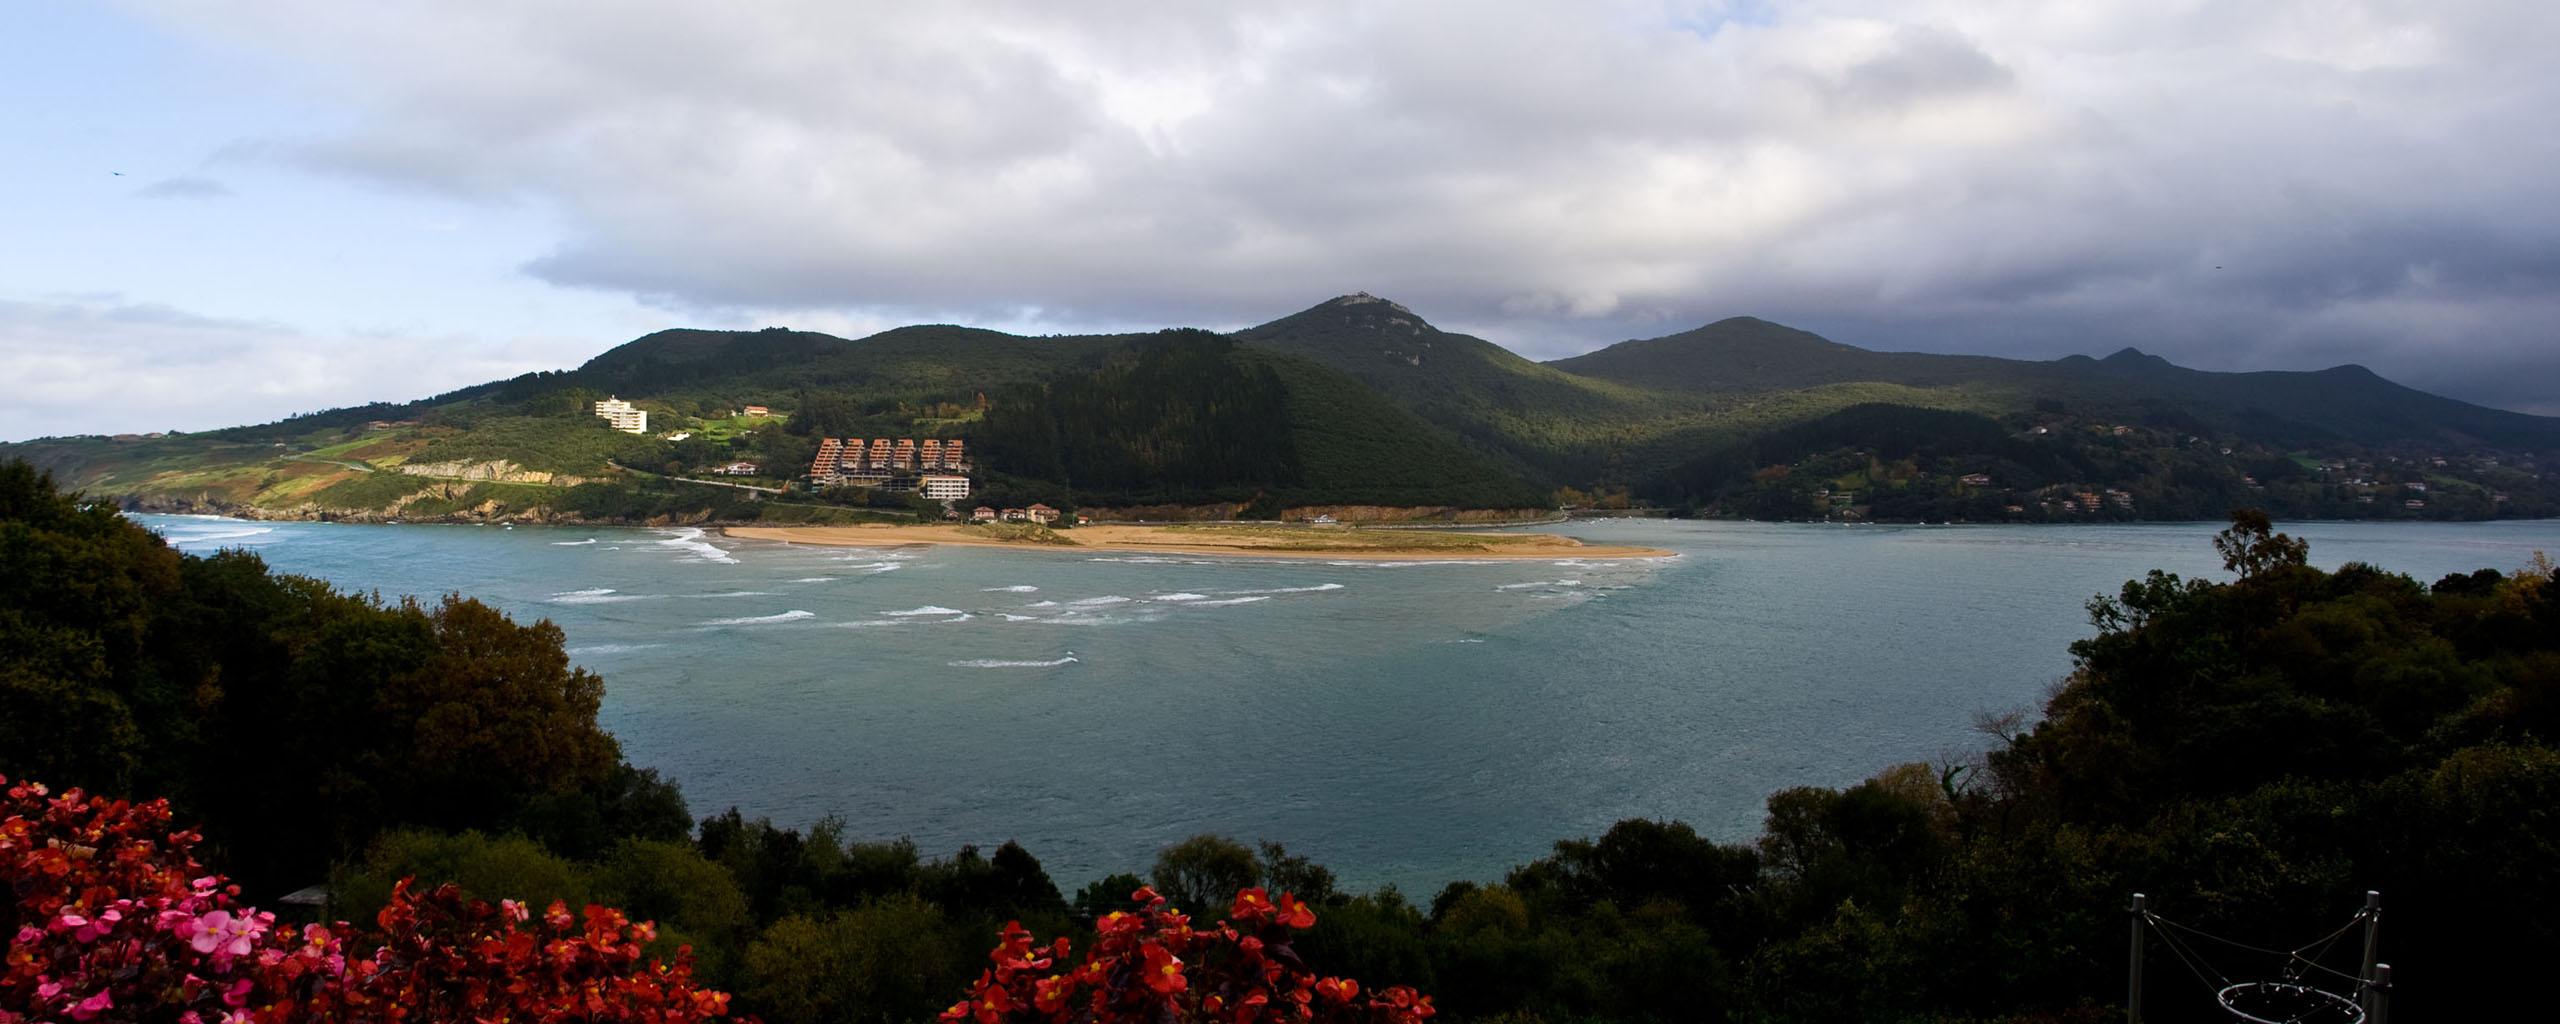 Mundaka Spain  City pictures : Coast near Mundaka, Biscay